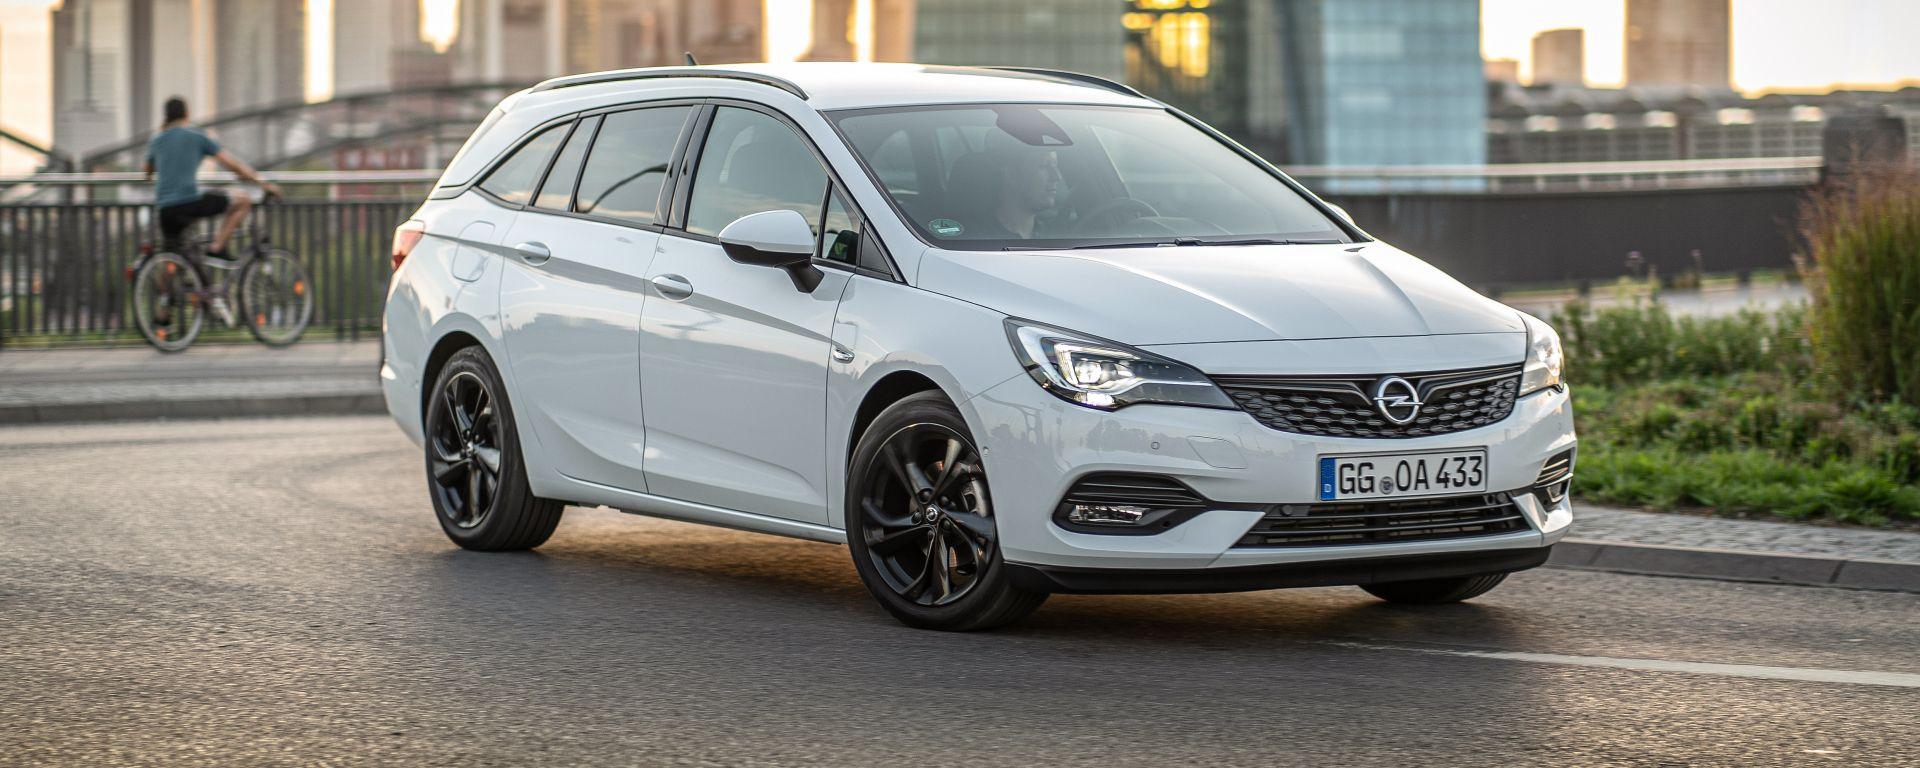 Opel Astra 2019: la variante station wagon